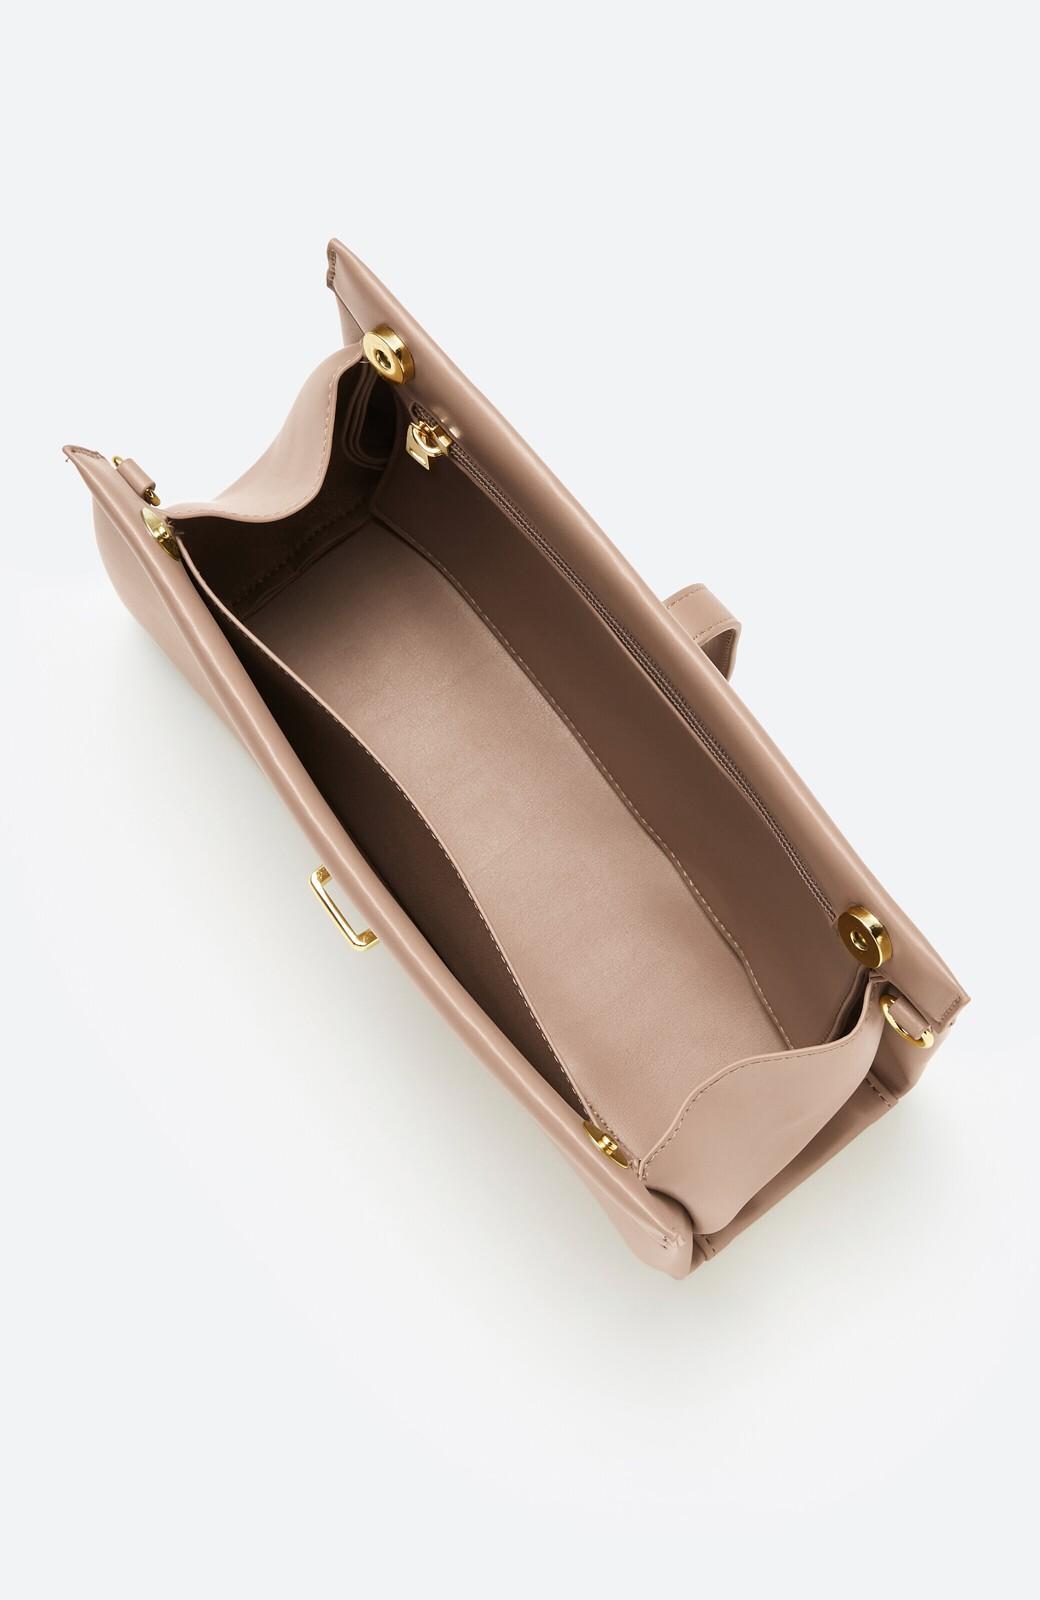 haco! 結婚式や二次会にも便利なショルダー&クラッチ2WAYバッグ <ベージュ>の商品写真2